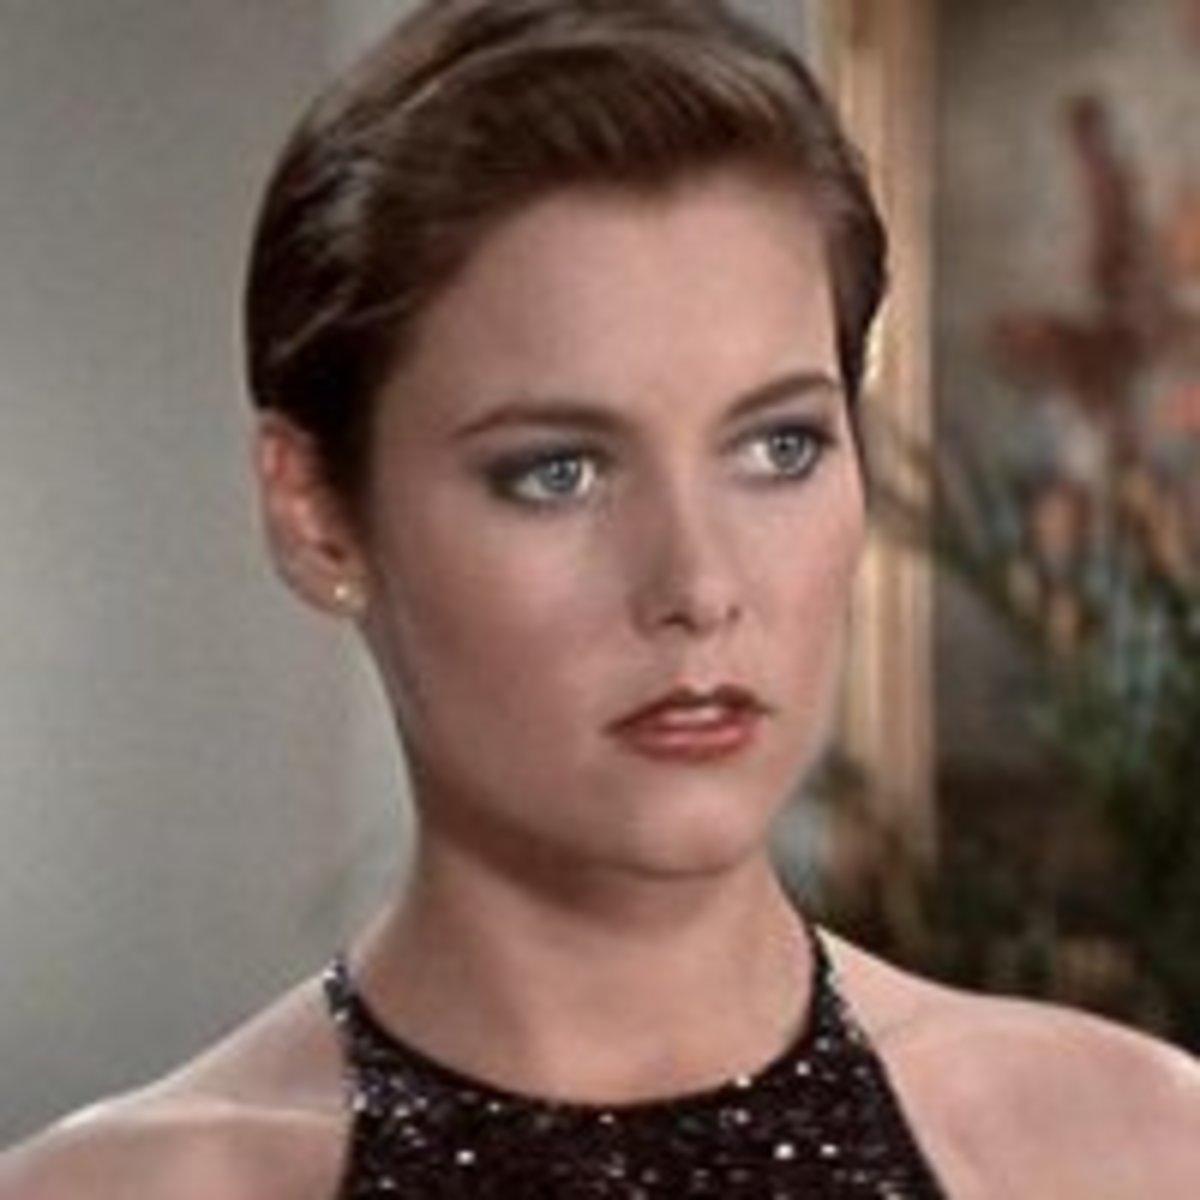 Carey Lowell as Pam Bouvier